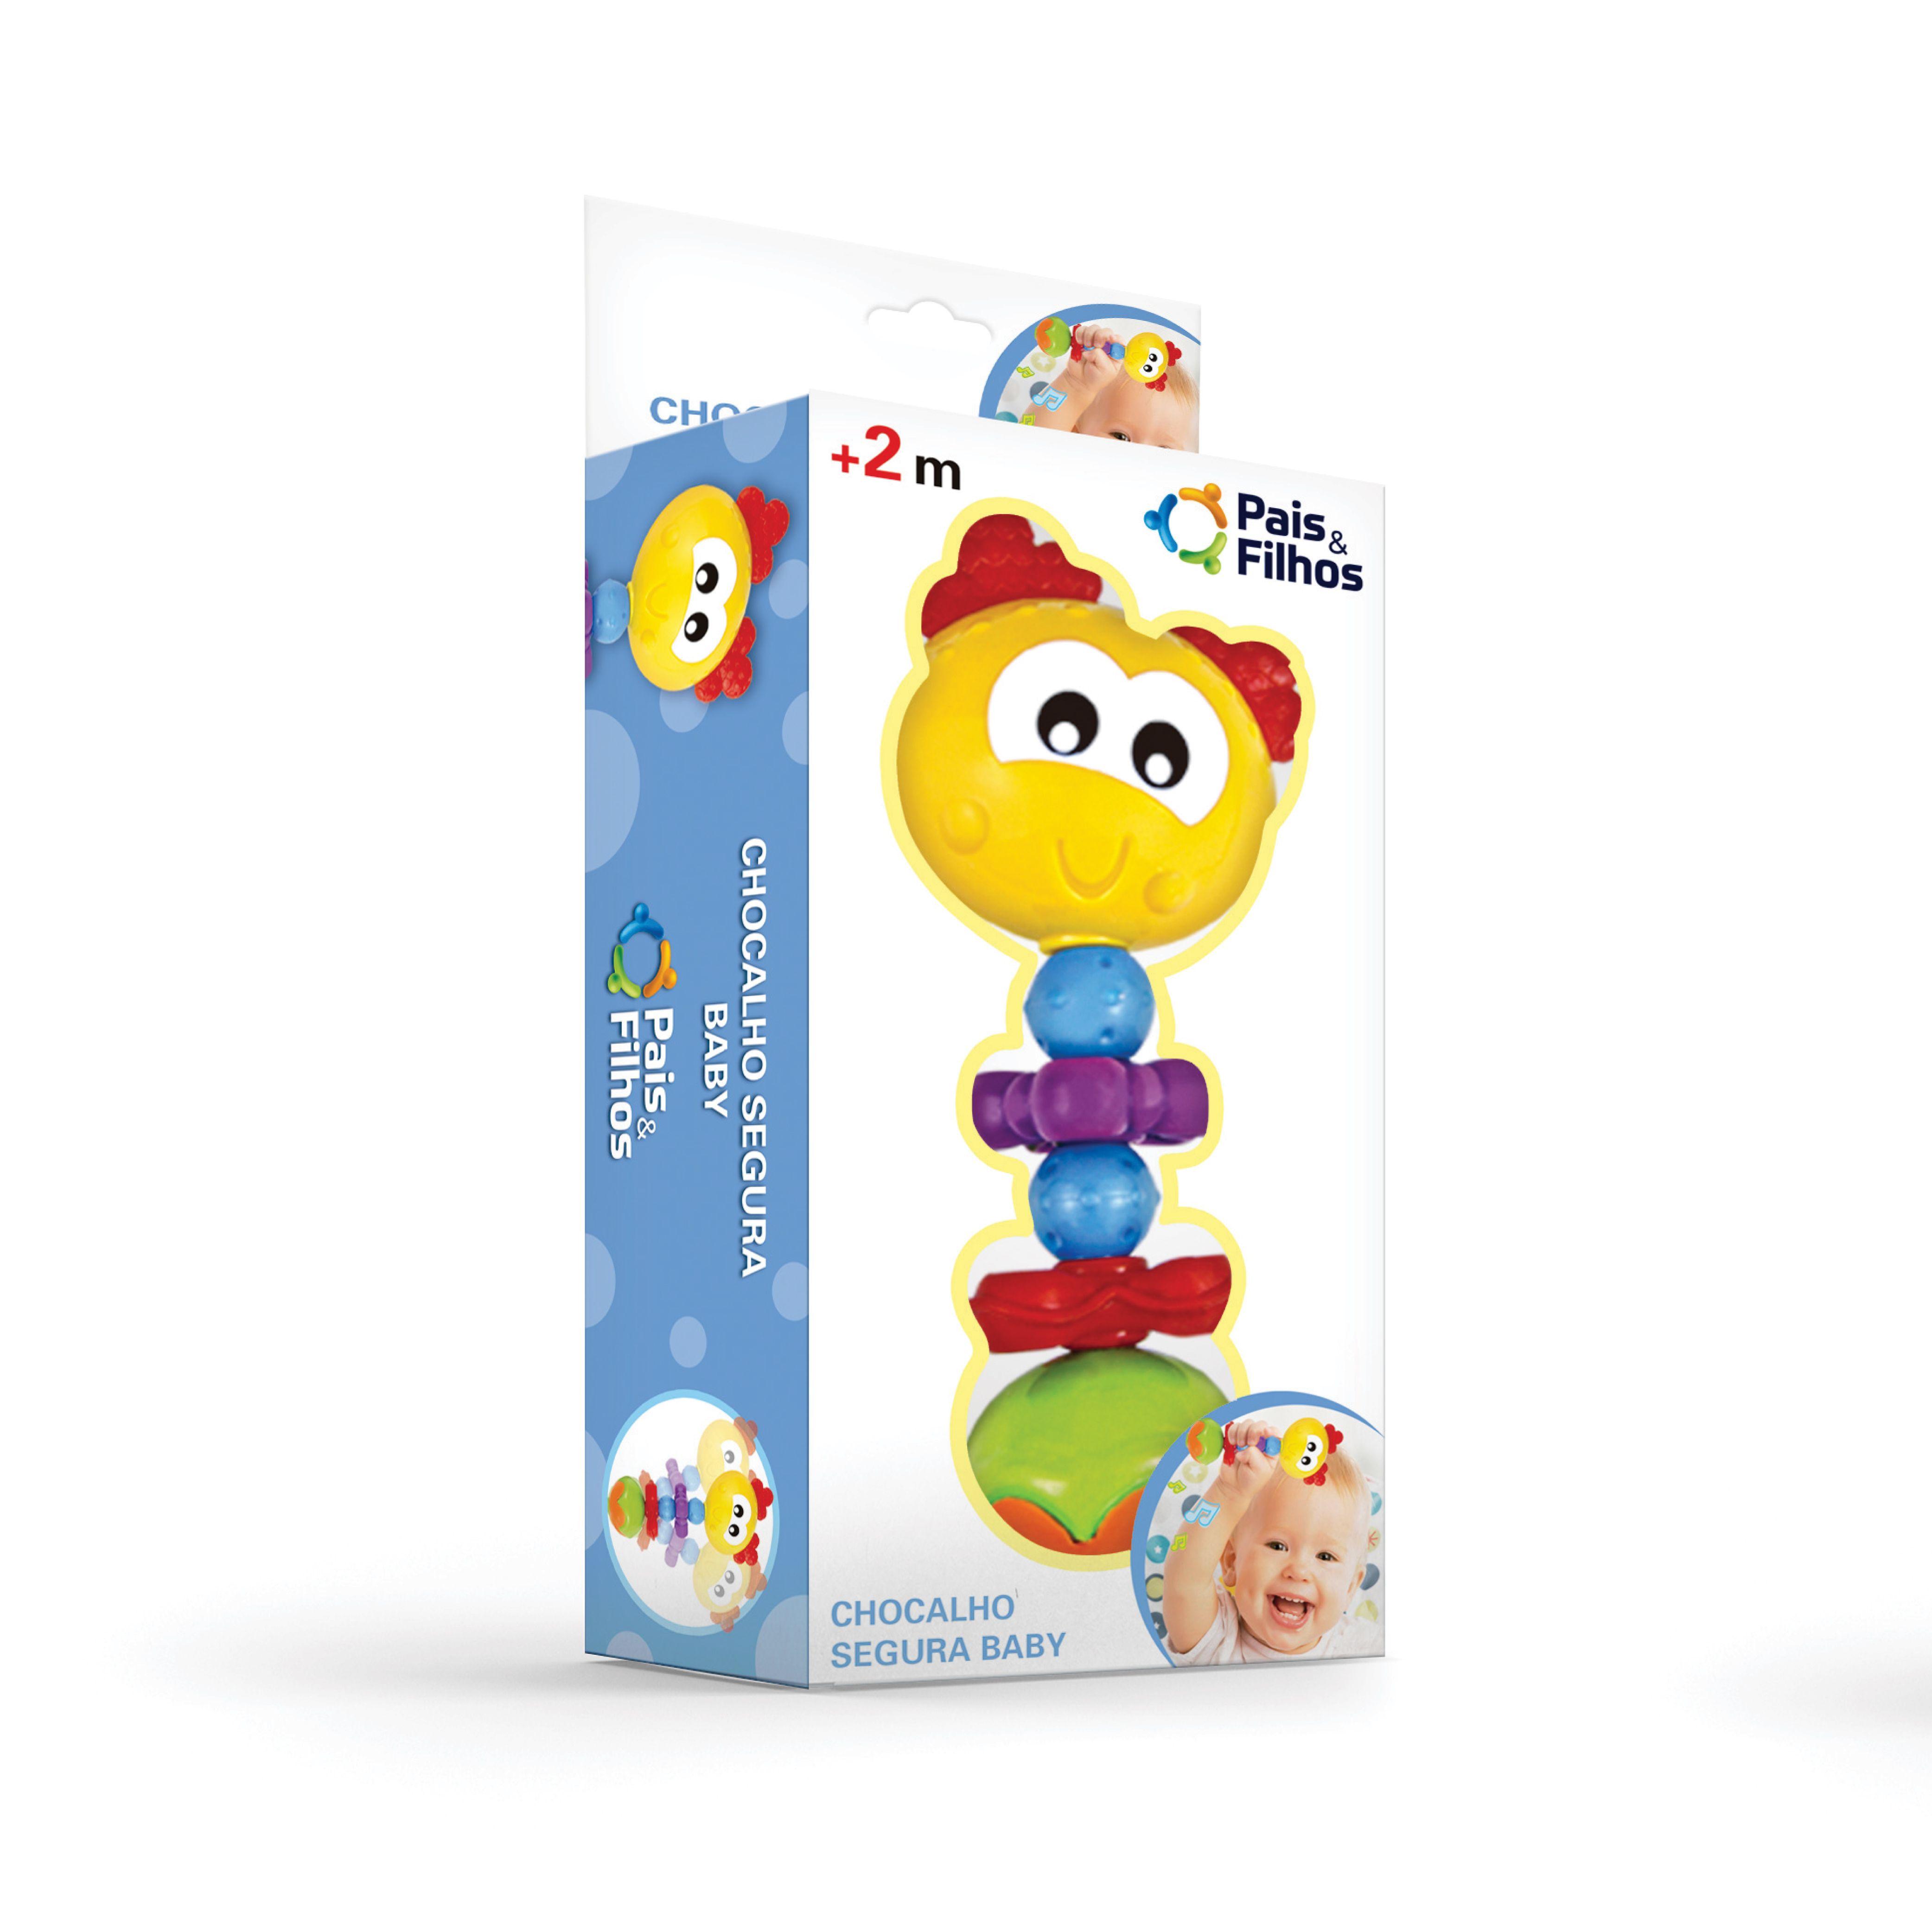 Chocalho Segura Baby-14616